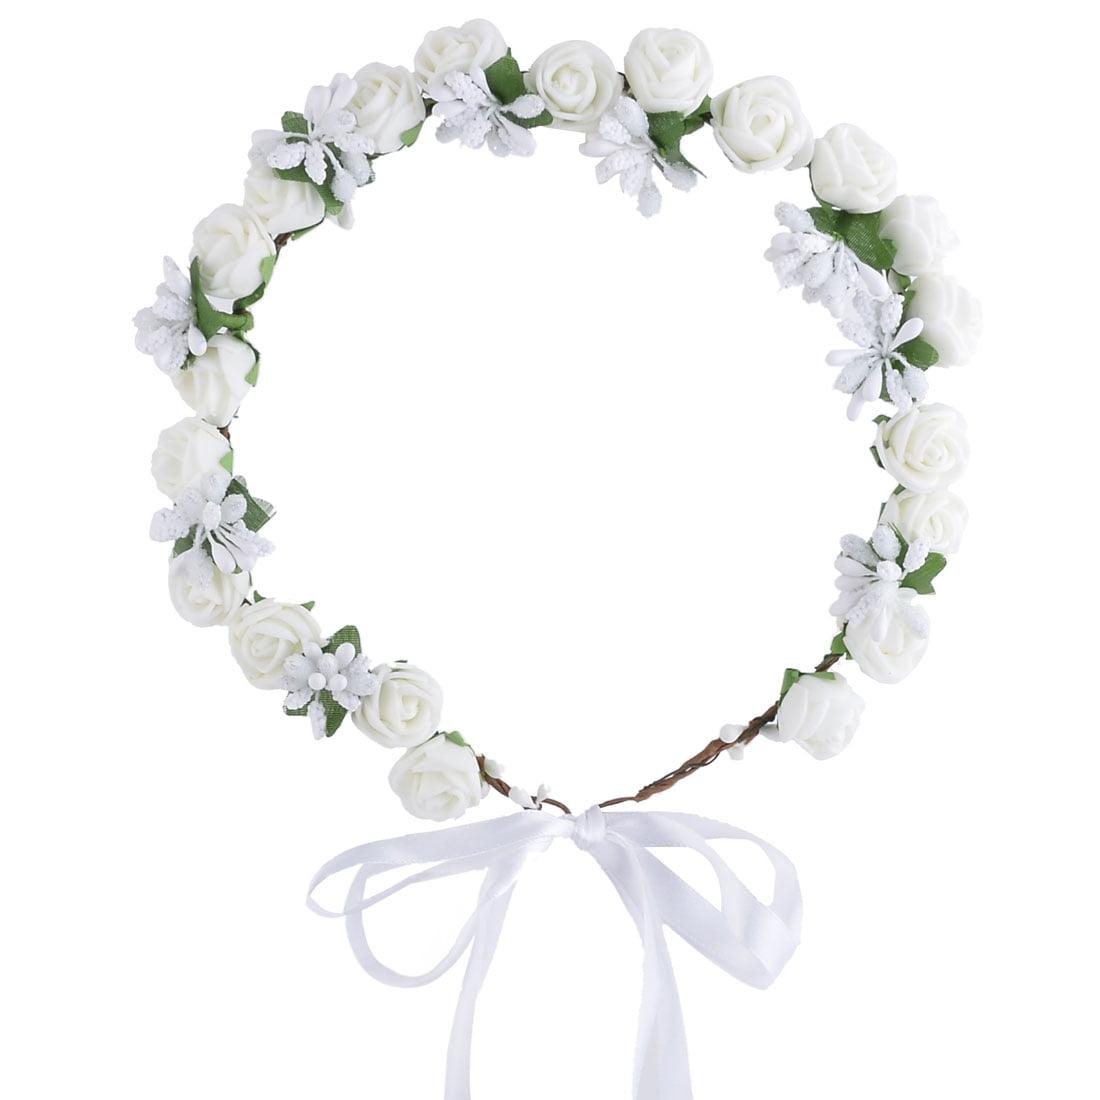 Wedding Travel Foam Crafts Artificial Rose Flower Head Garland Decor